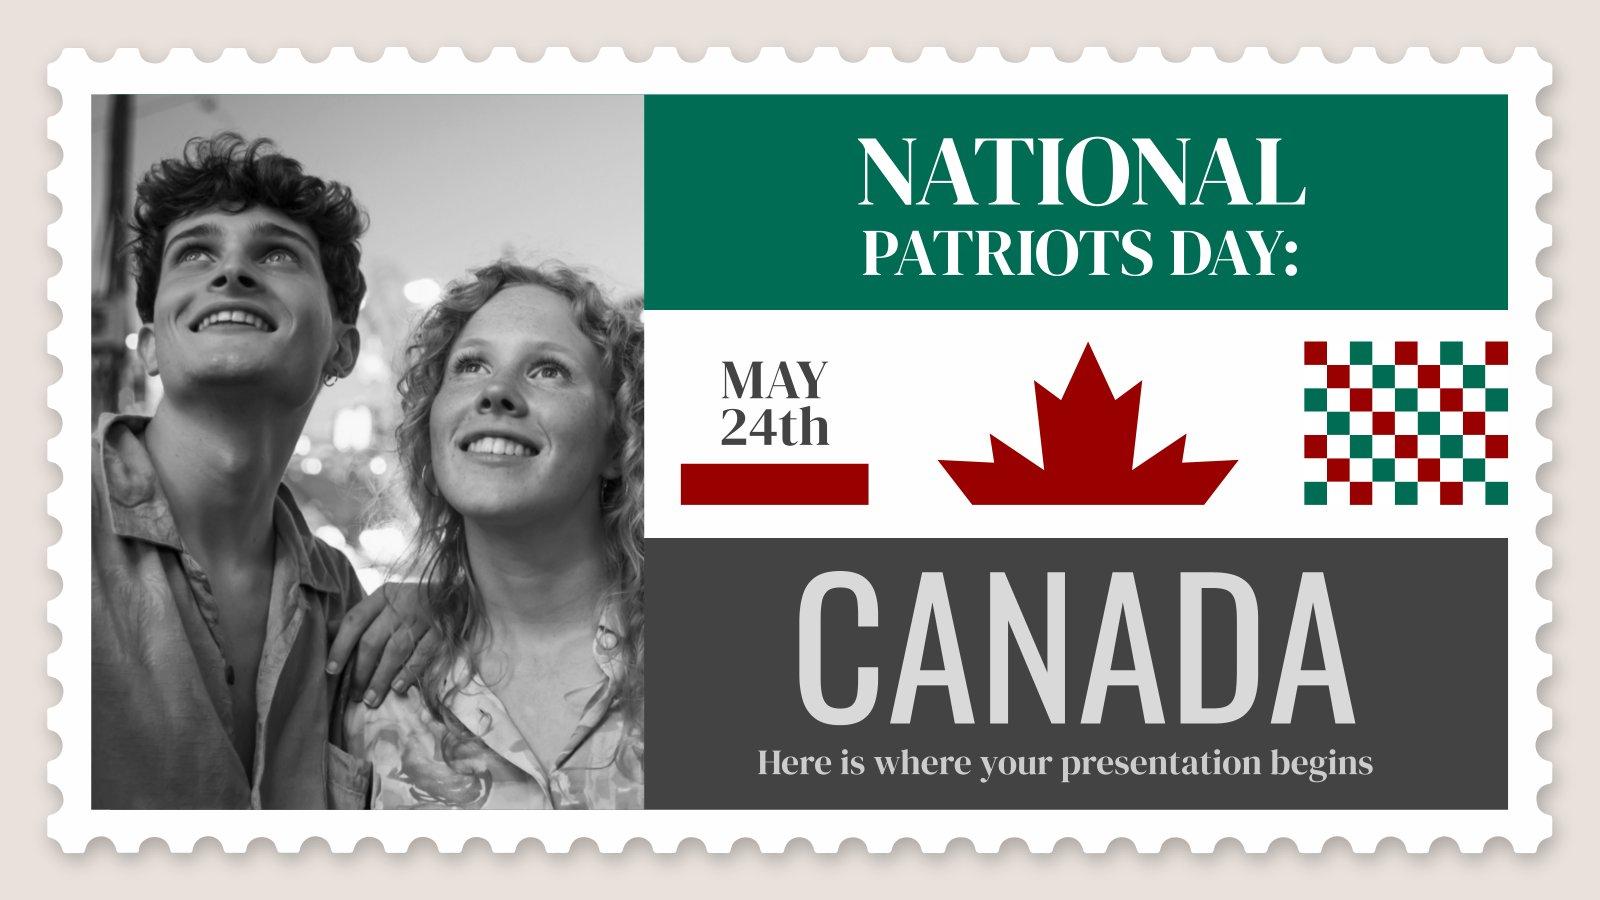 National Patriots Day: Canada presentation template